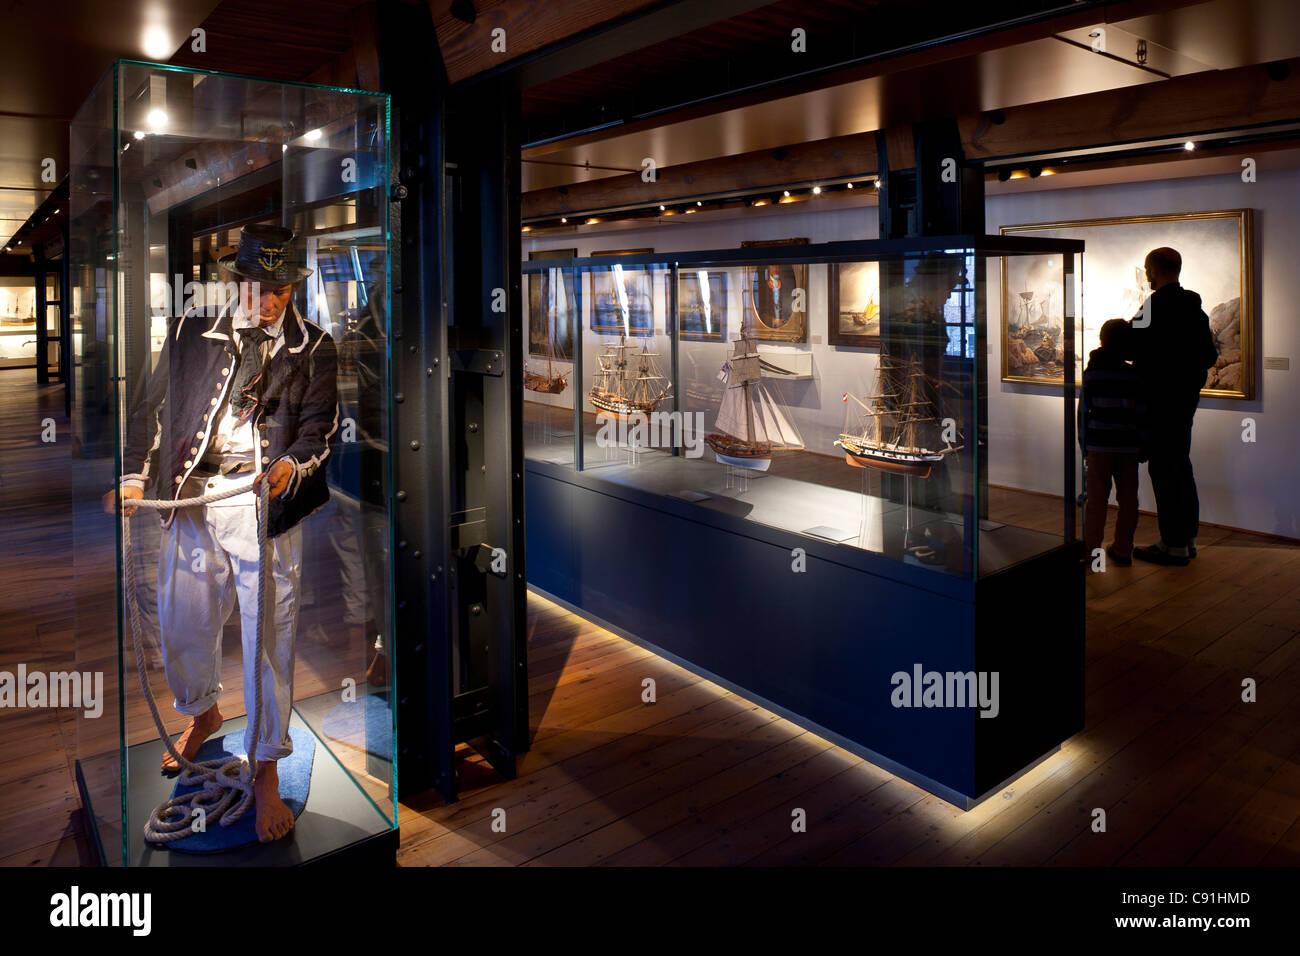 Figure and model sailing ships at International Maritime Museum Hamburg, Hanseatic city of Hamburg, Germany, Europe - Stock Image